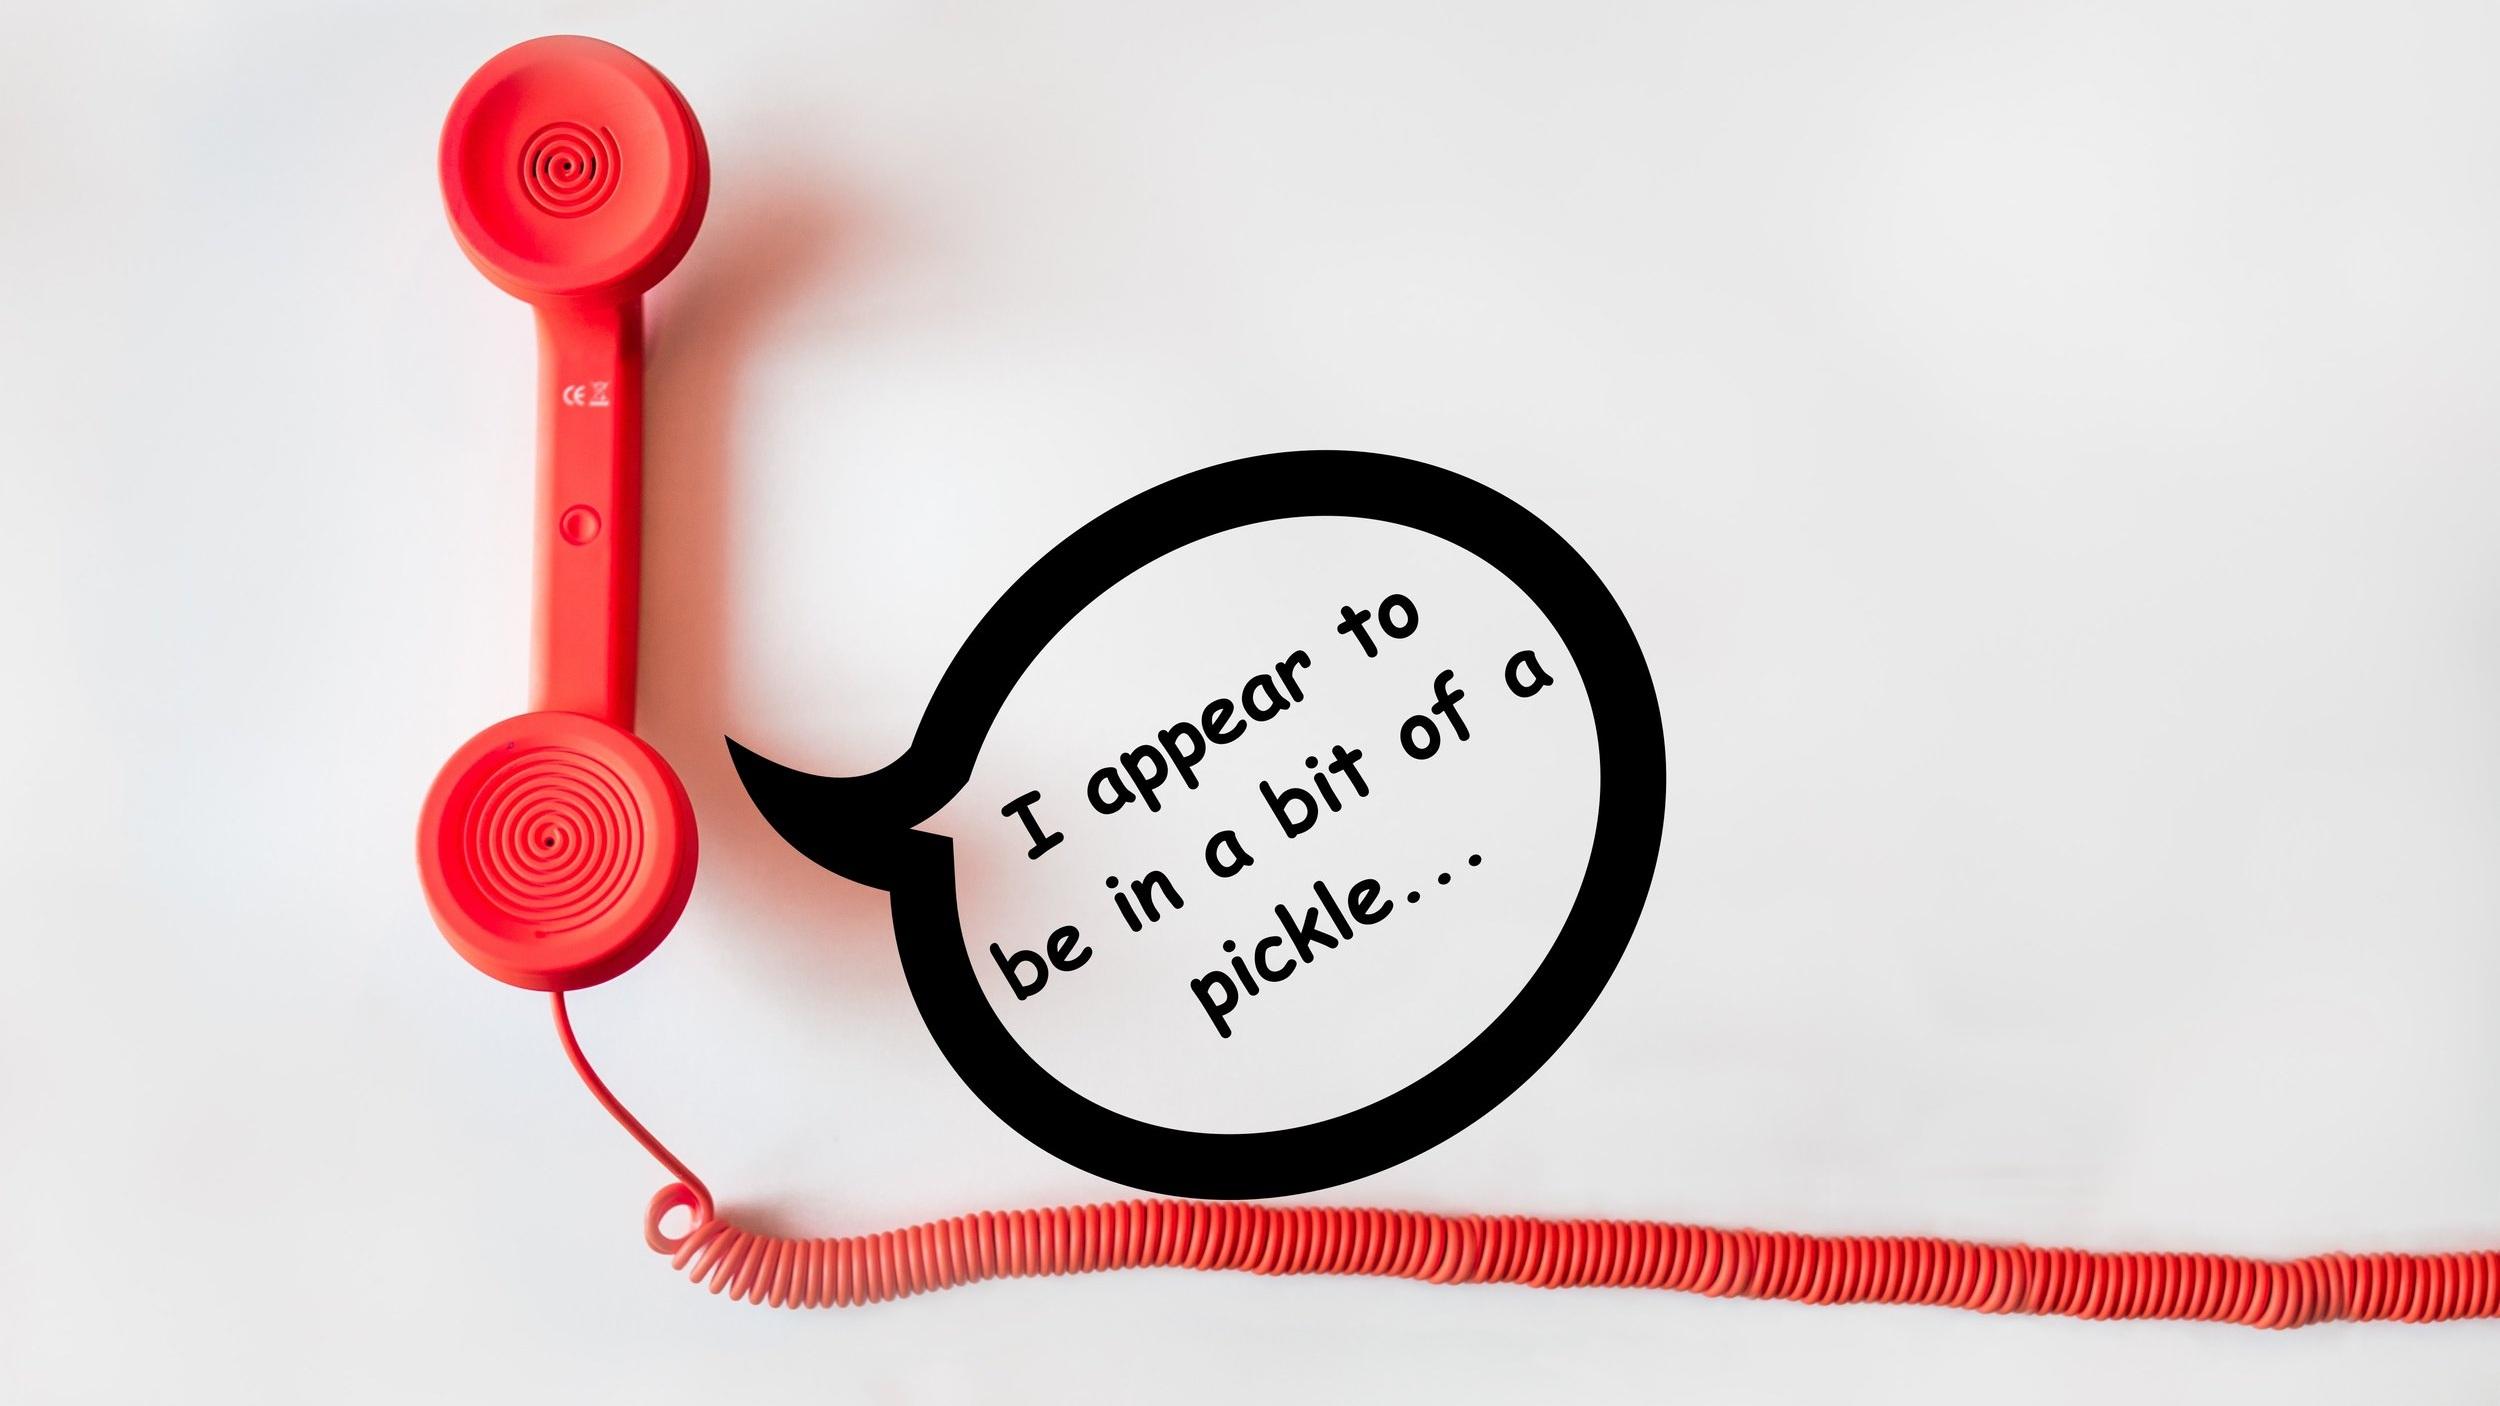 red+phone+communication+emergency